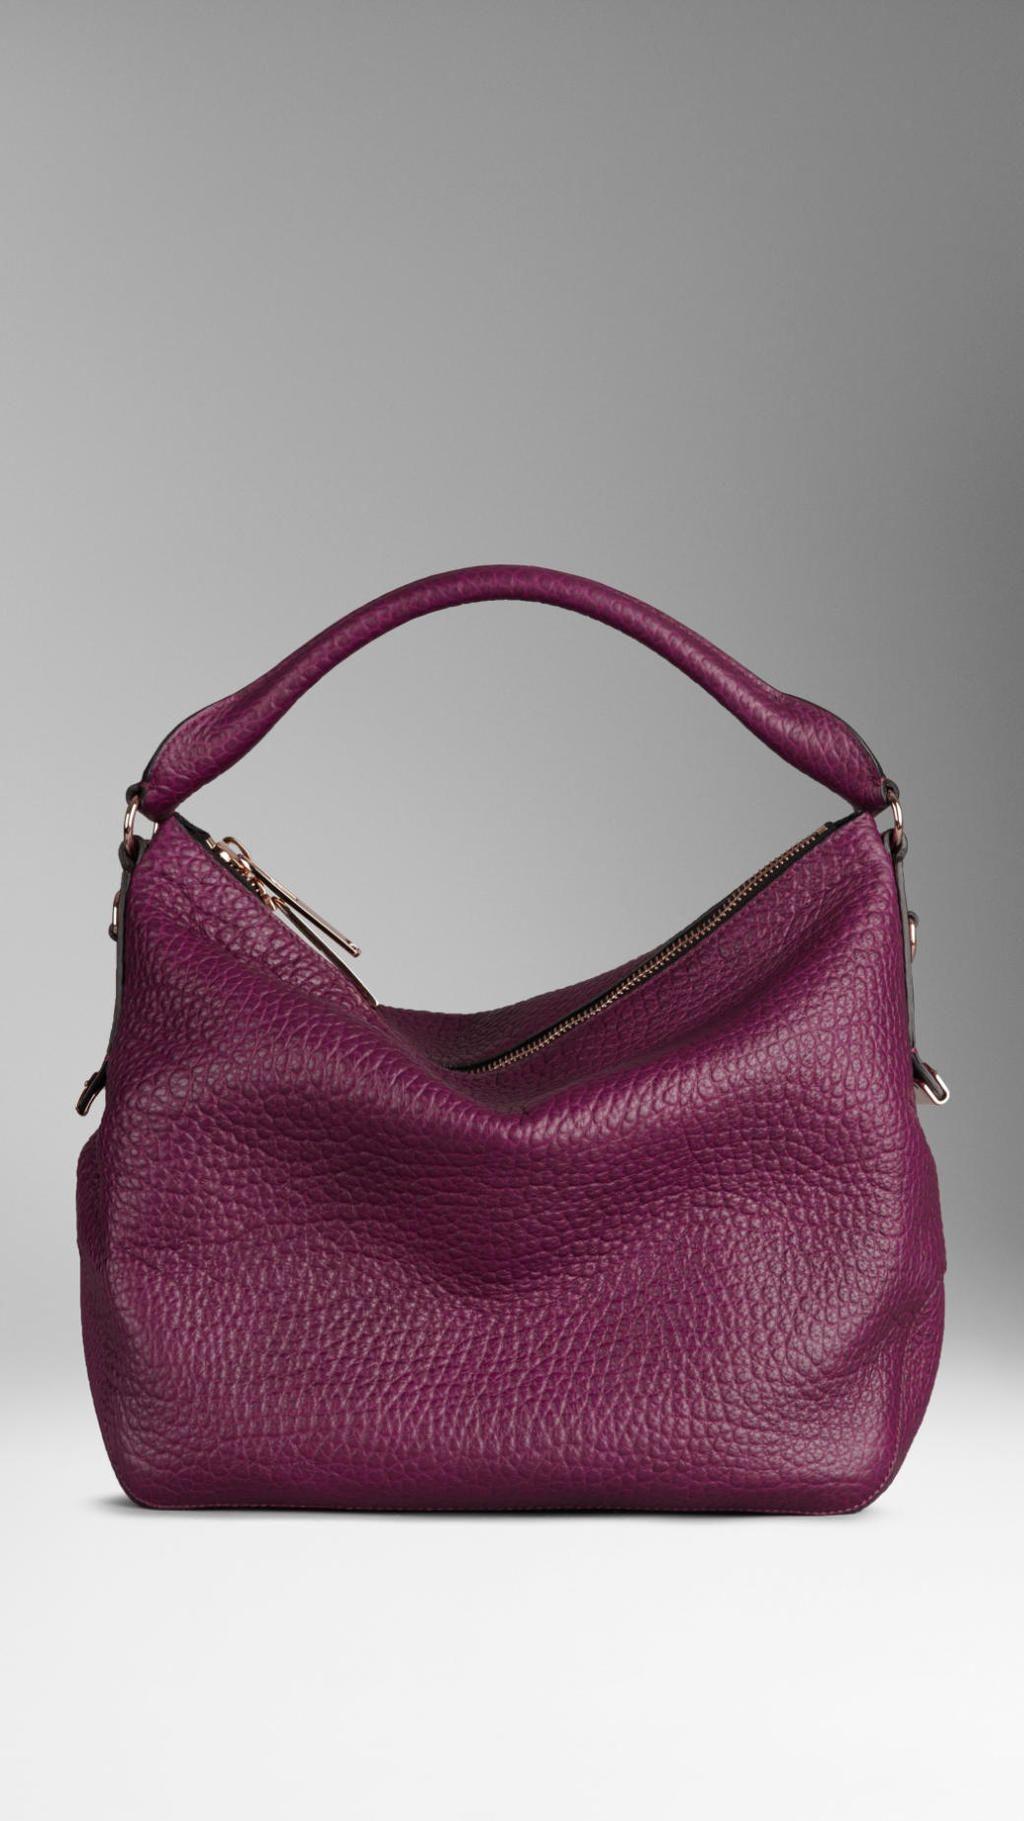 7e22d6eb17e0 Burberry - Purple Small Heritage Grain Leather Hobo Bag